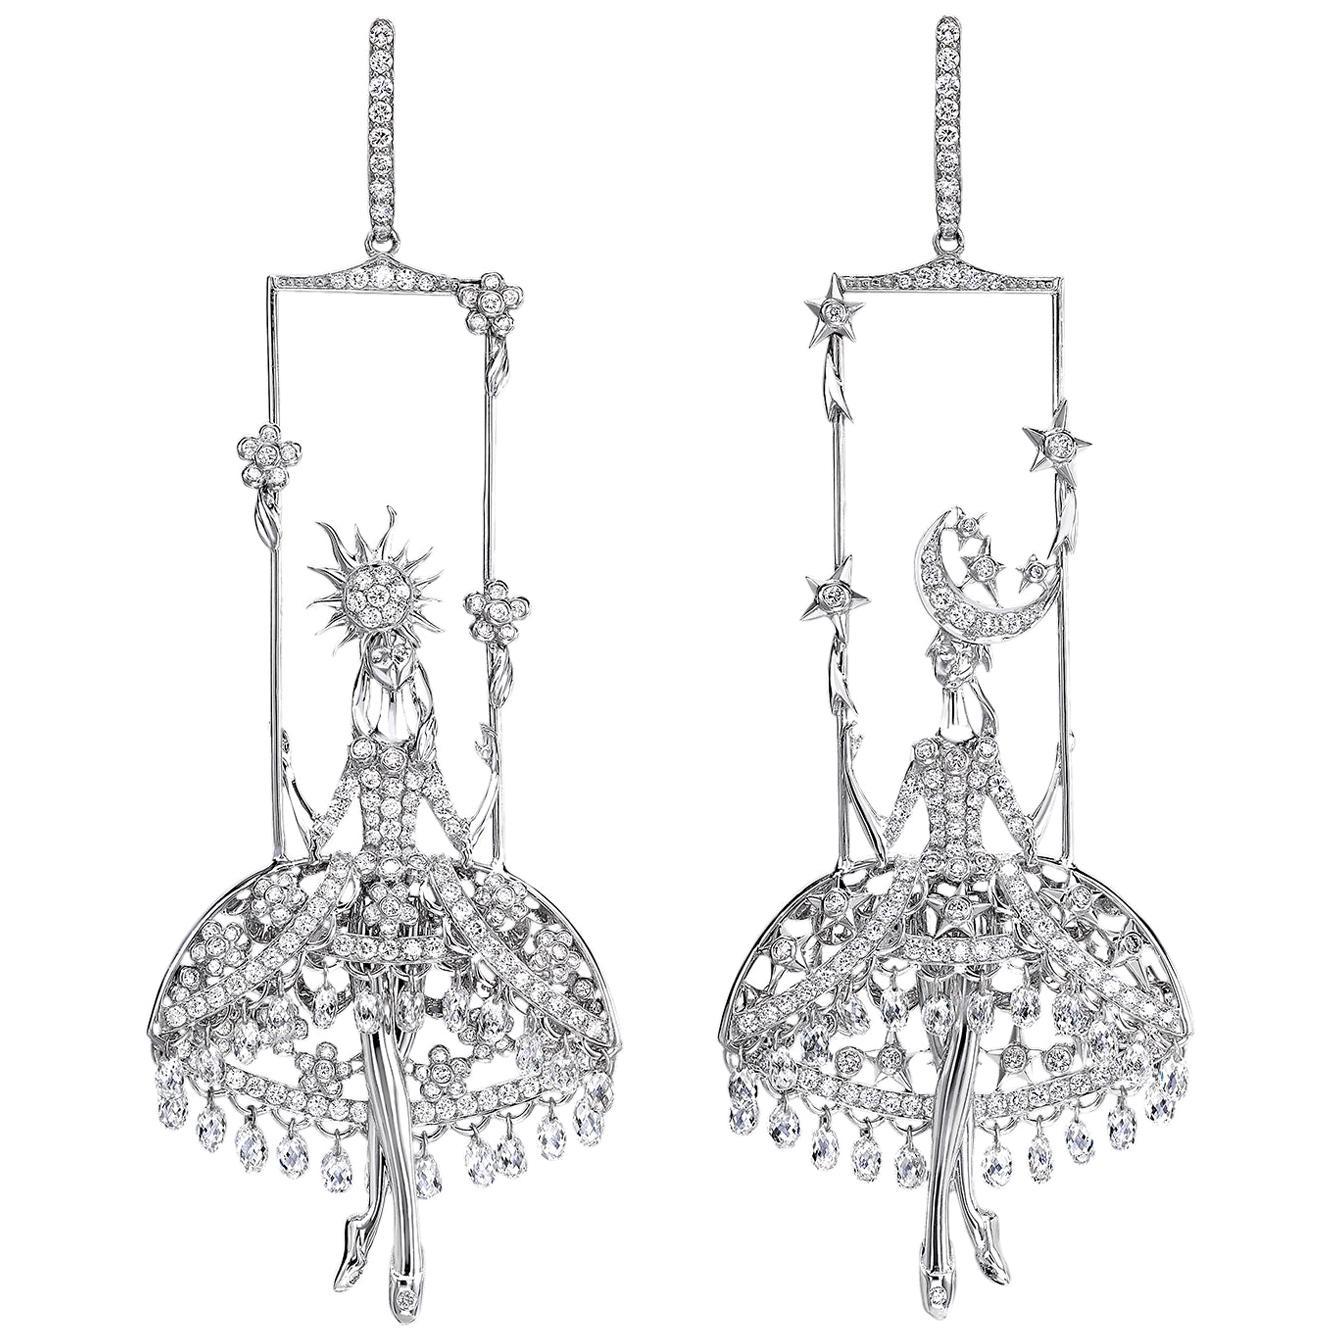 Sybarite Jewellery Fairies Chandelier Earrings 8.95 Carat Diamond 18 Karat Gold